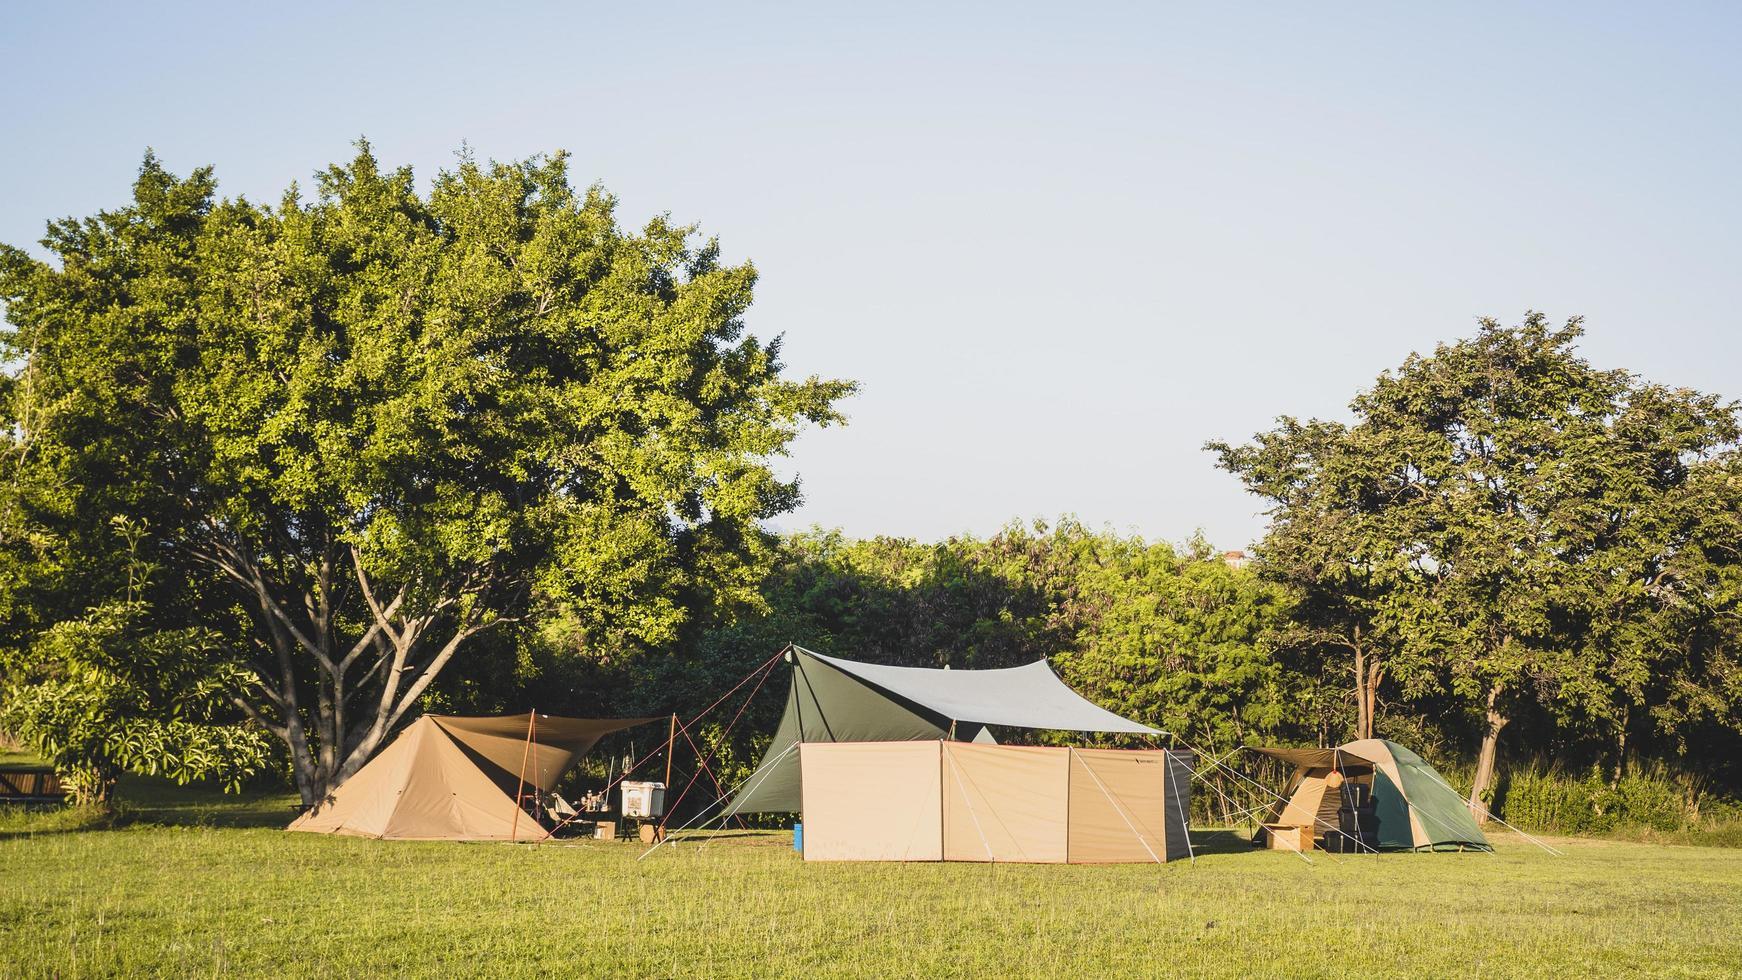 camping tente touristique photo